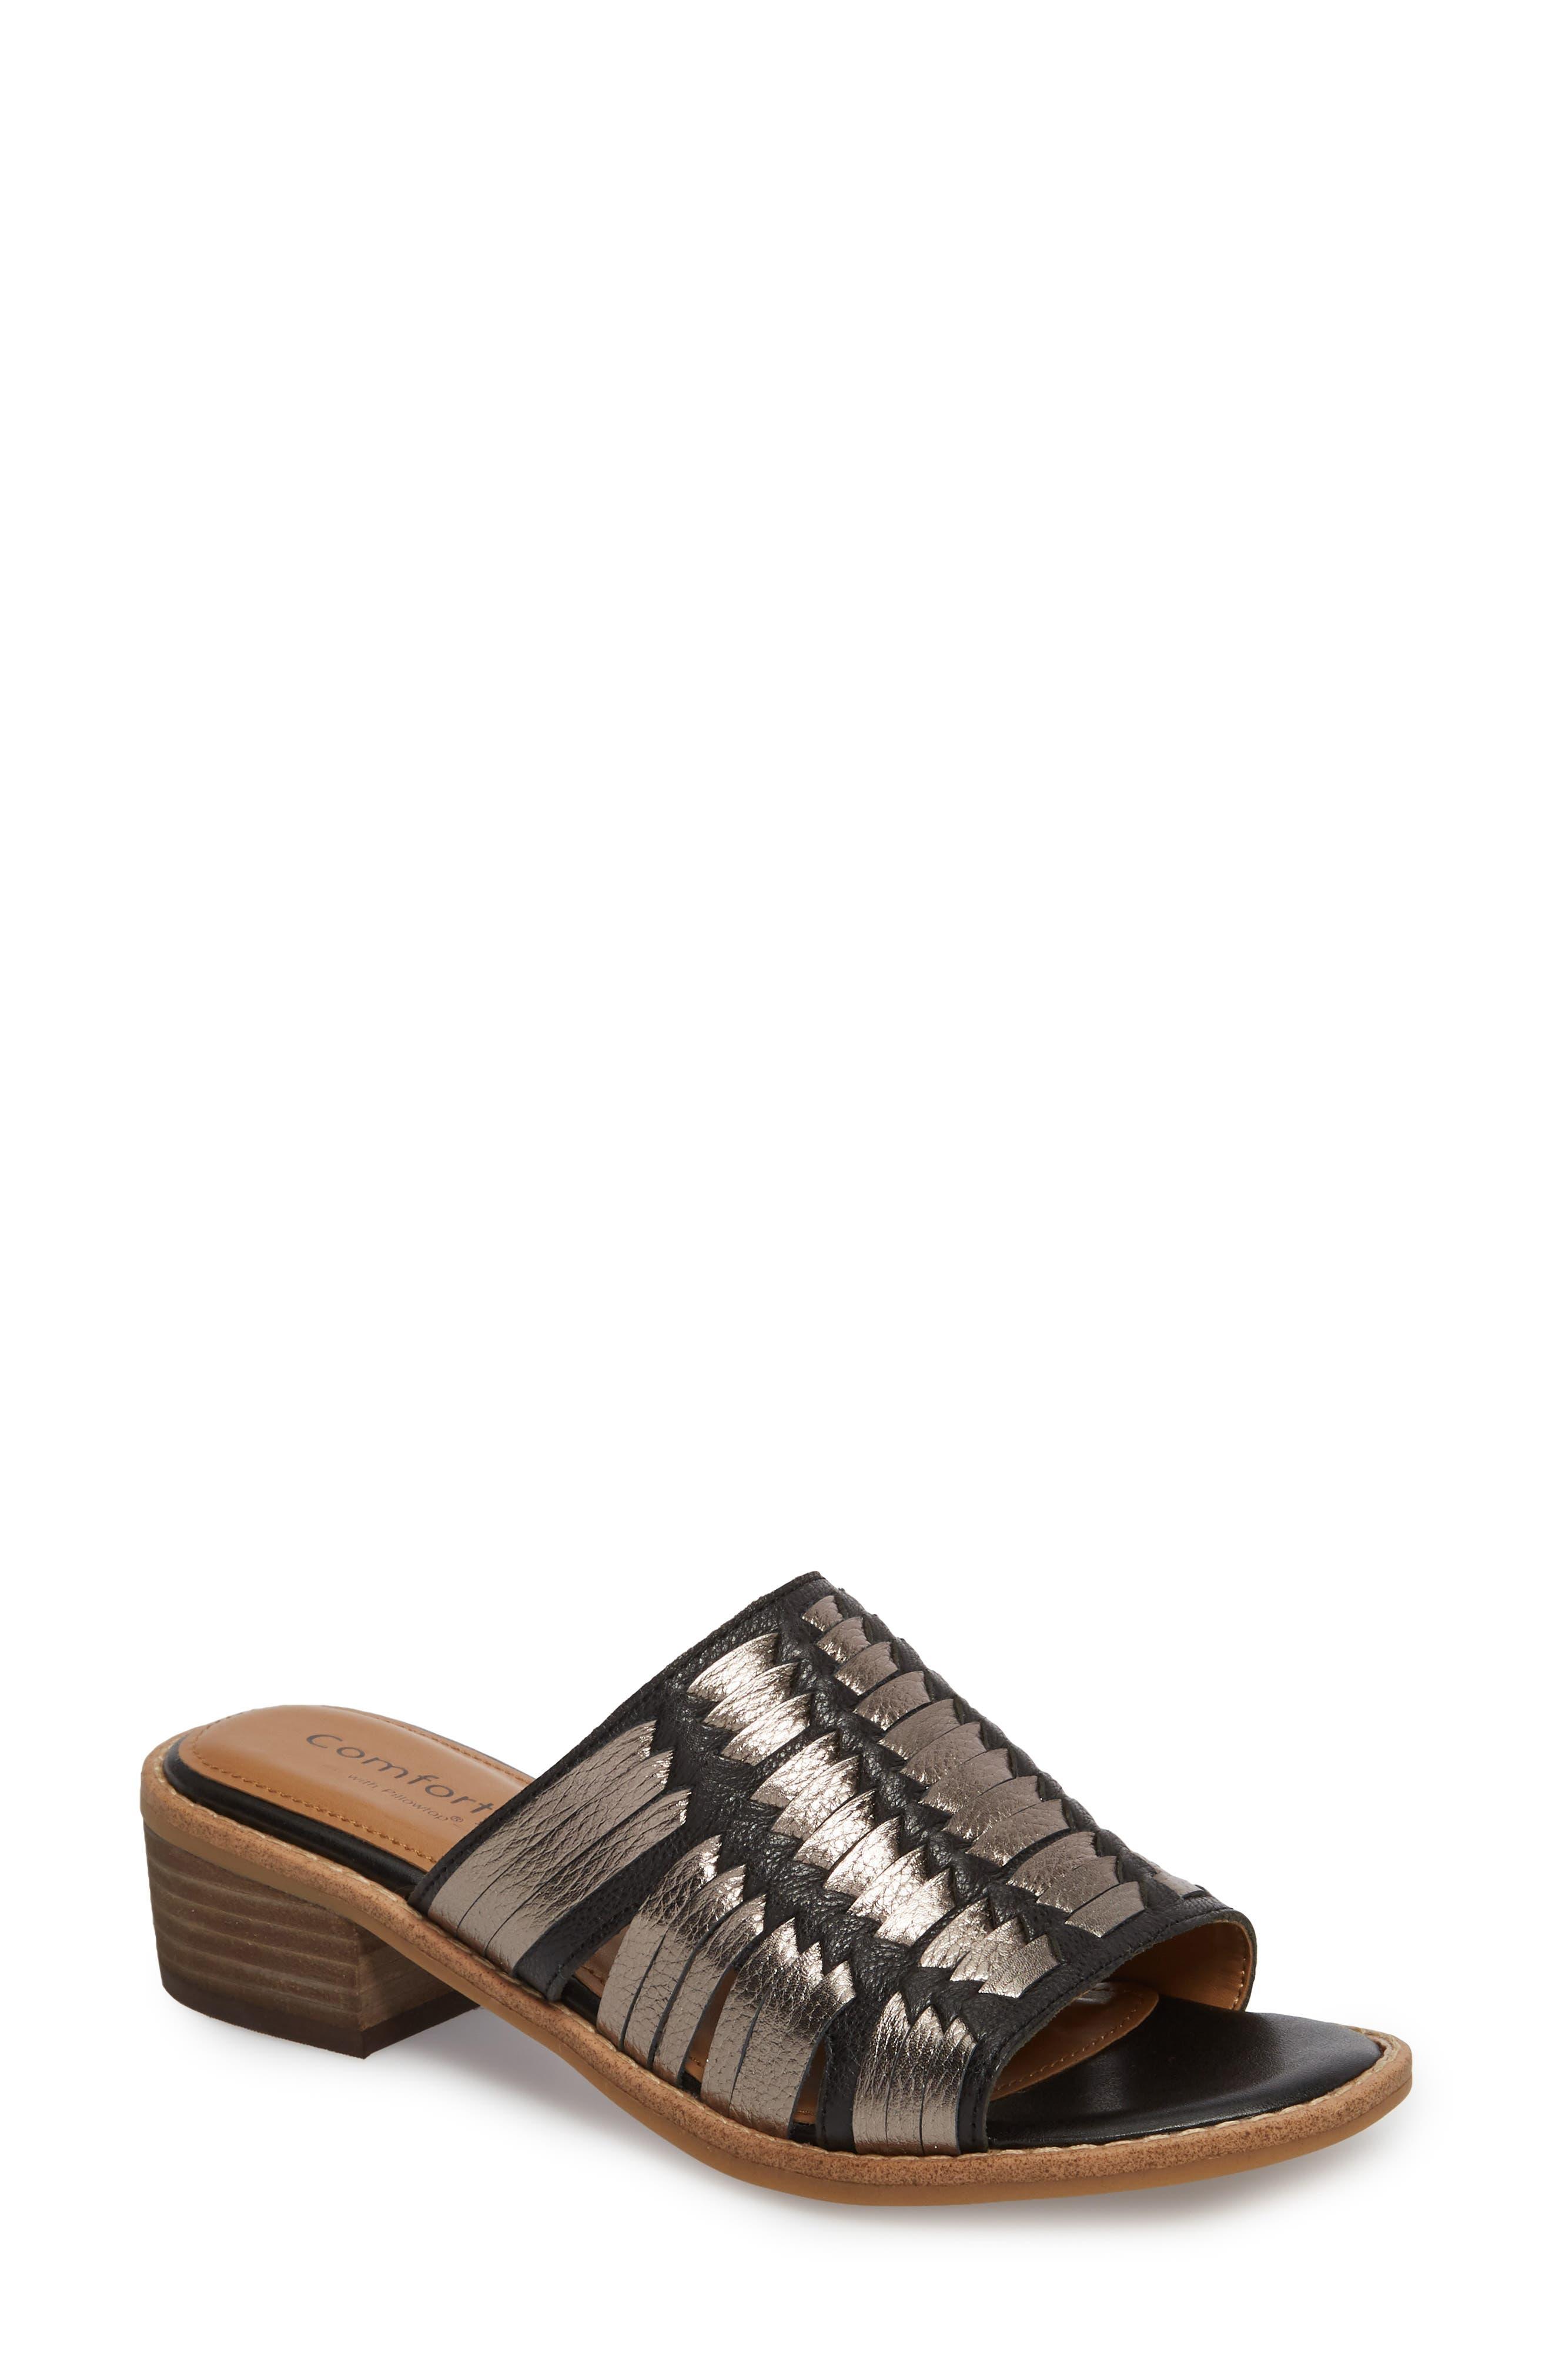 Brileigh Slide Sandal,                             Main thumbnail 1, color,                             Black Leather